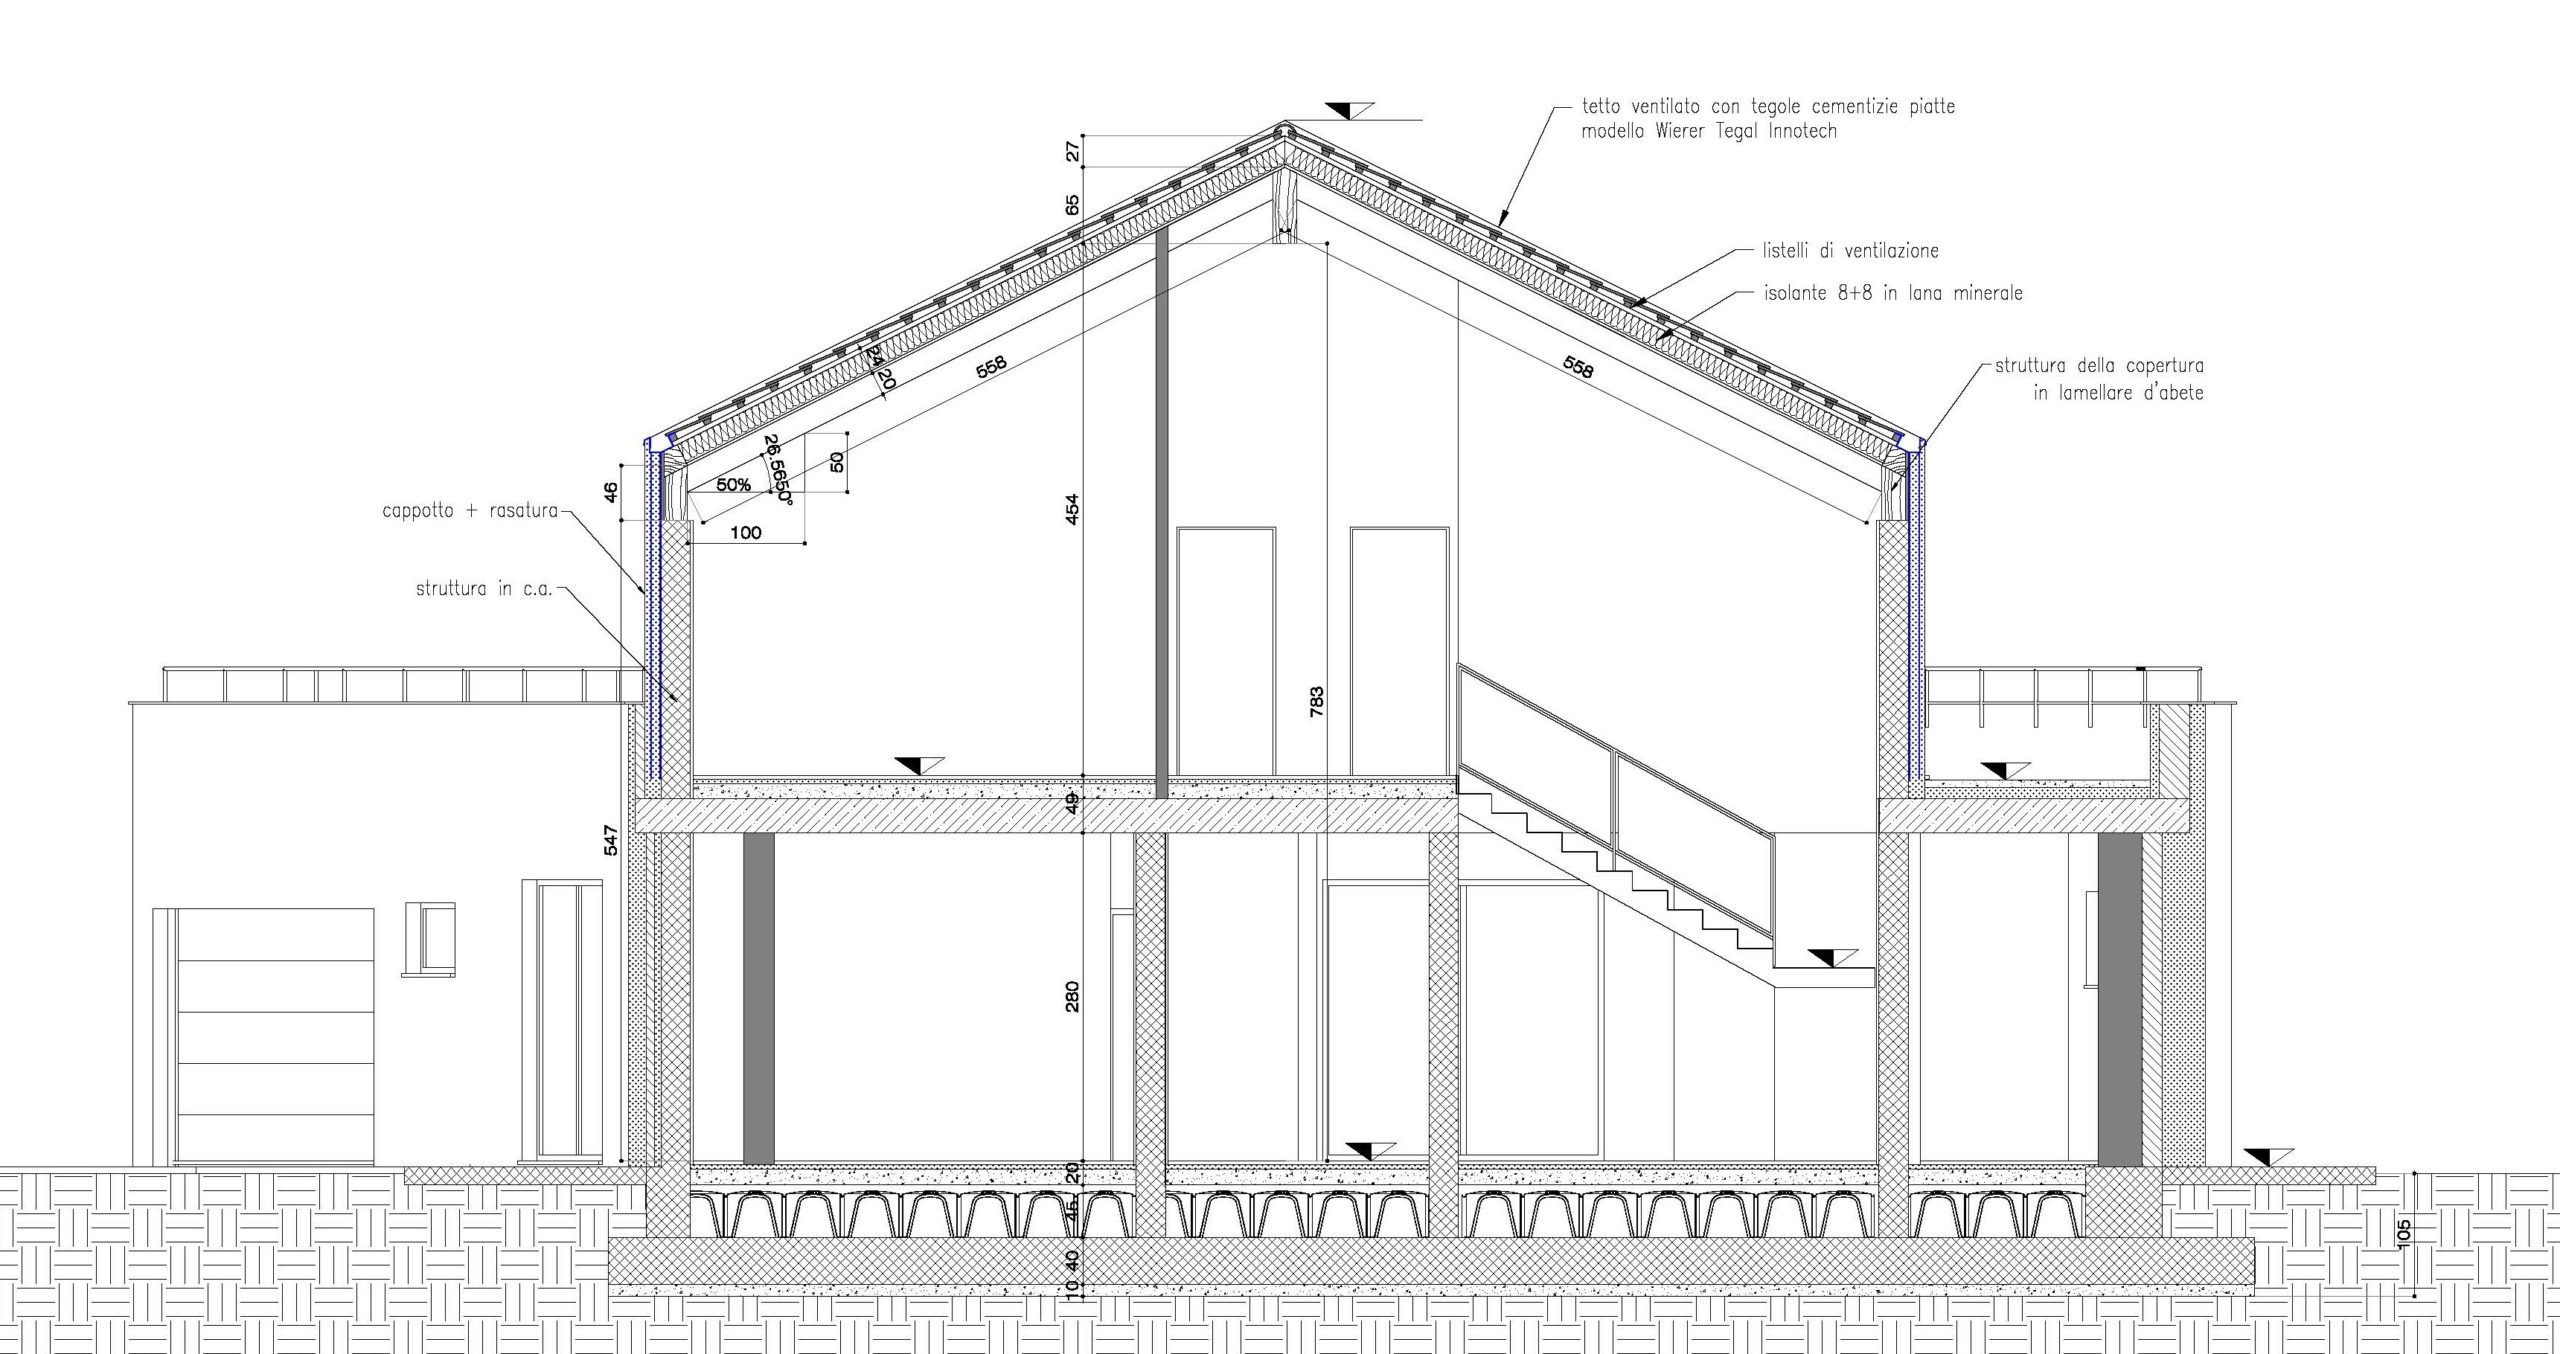 63x30 - sezione AA 50 - cantiere 01